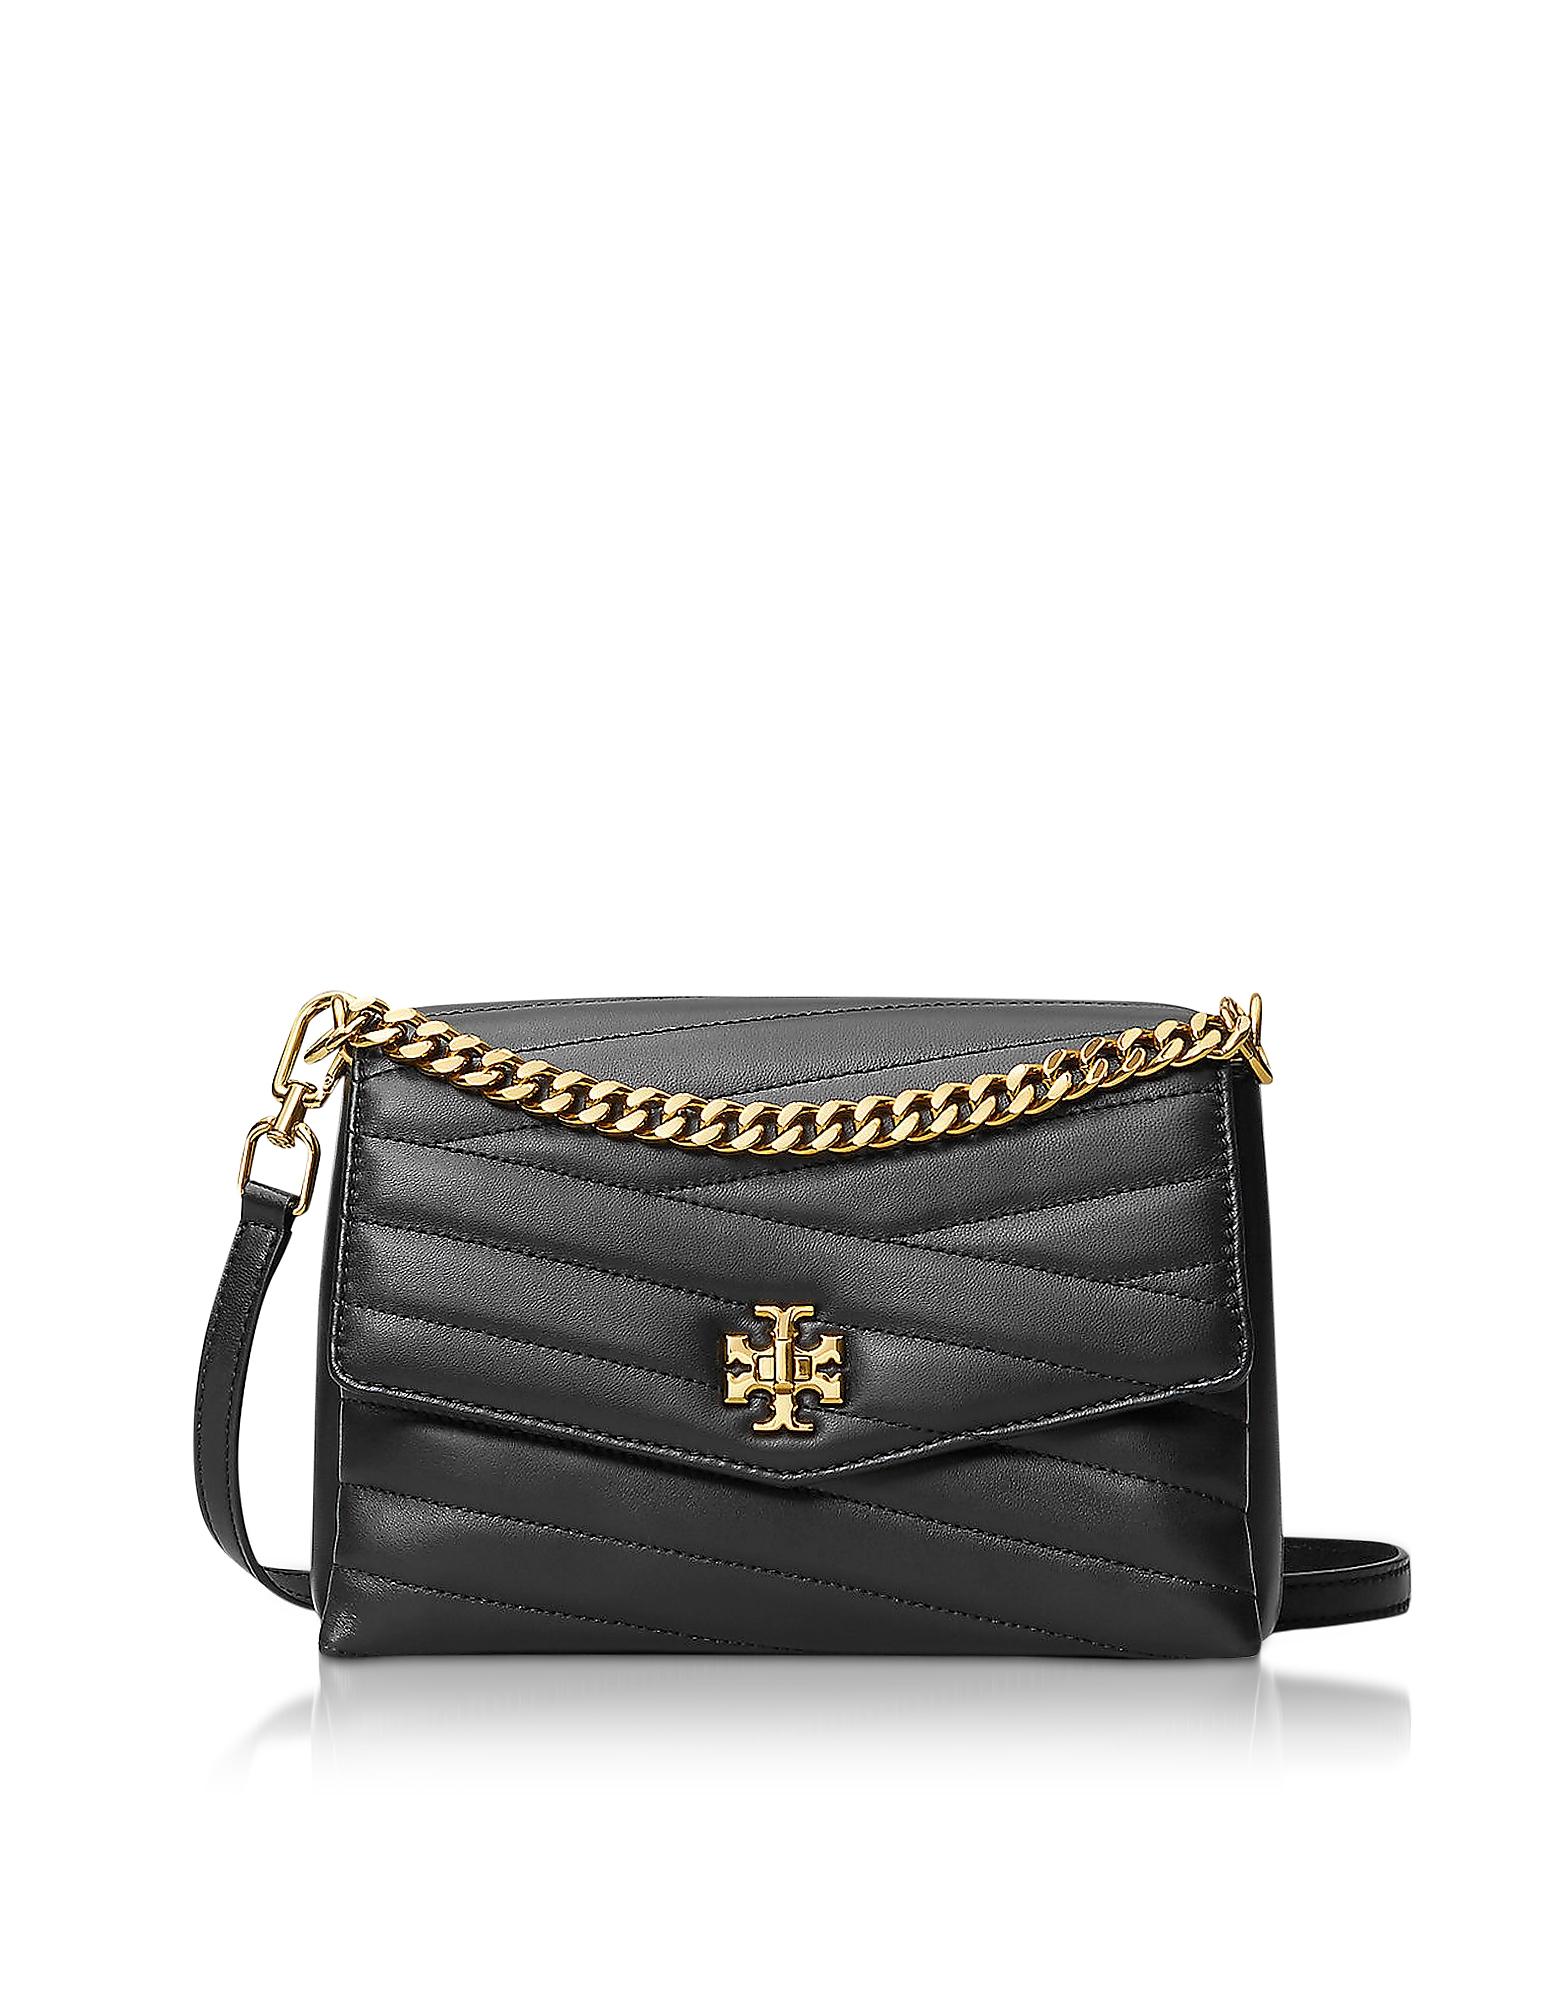 Kira Chevron Cross-Body Bag